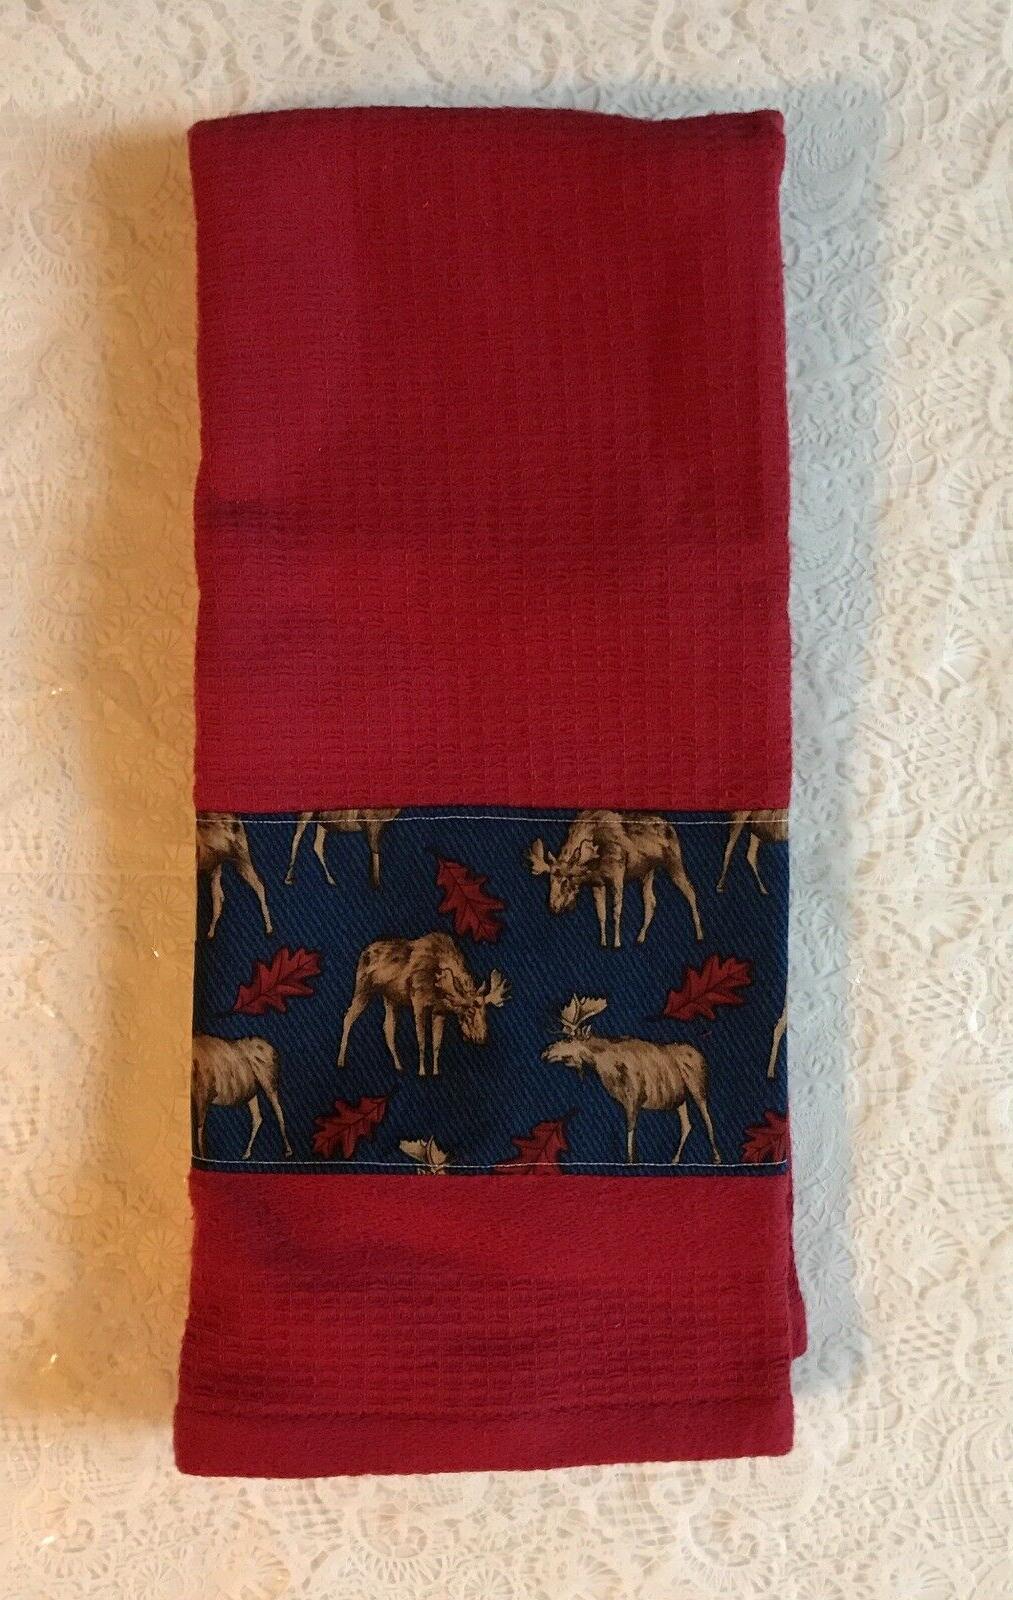 Nature wild animals - Moose - Kitchen bath home decor red to